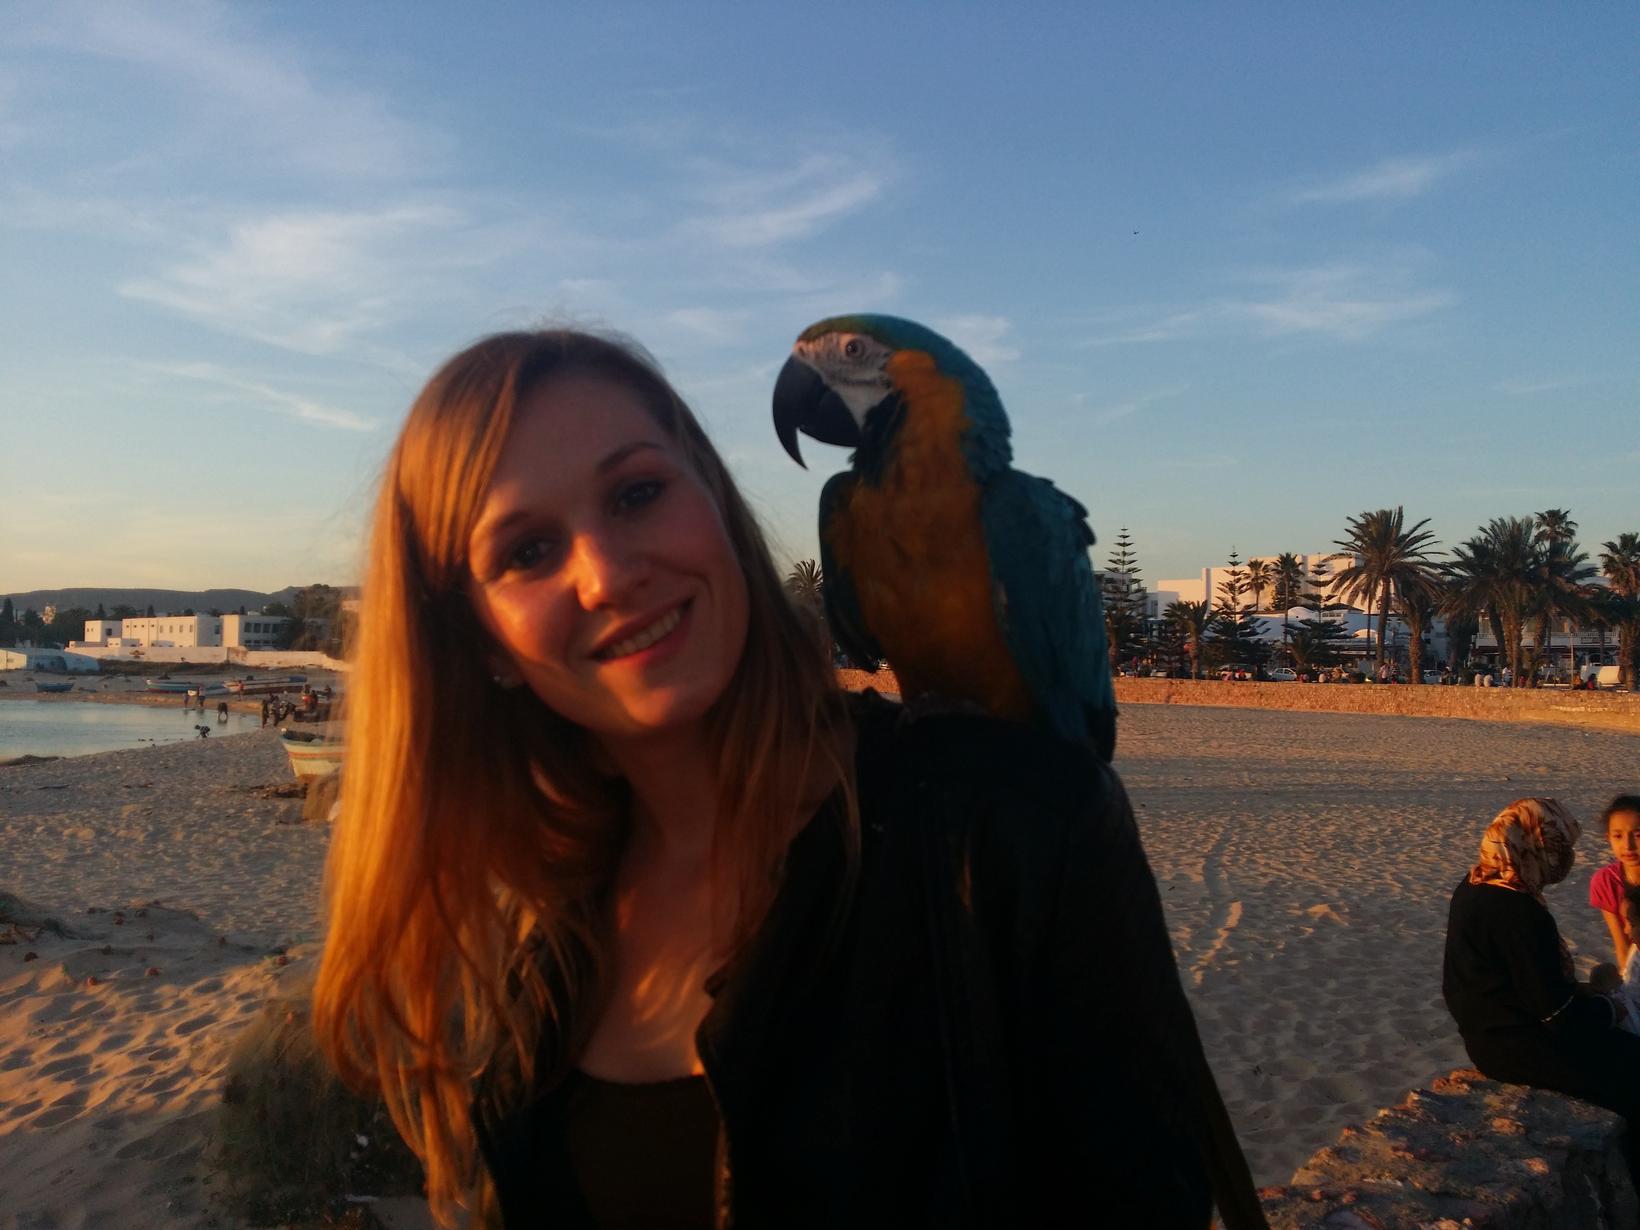 Mélanie from Boquete, Panama